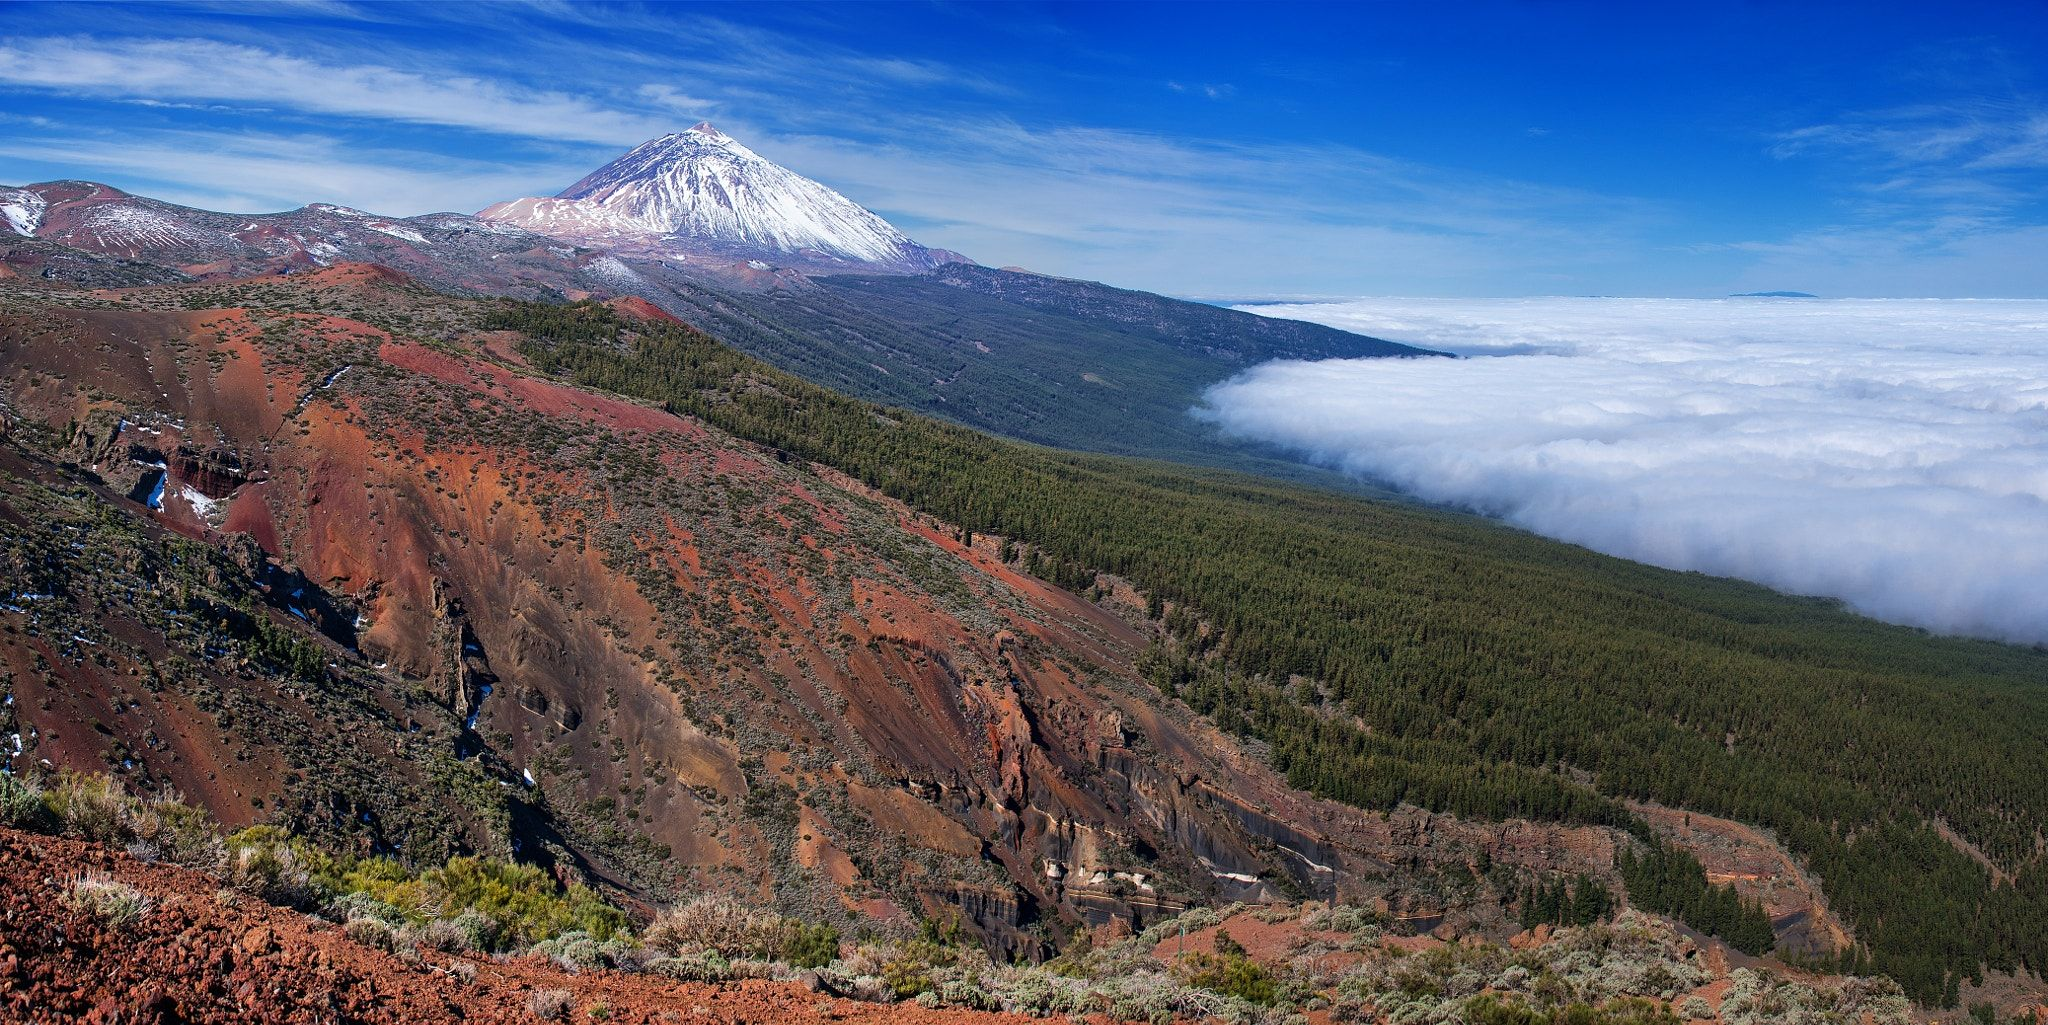 Mount Teide in tenerife spain - YouTube